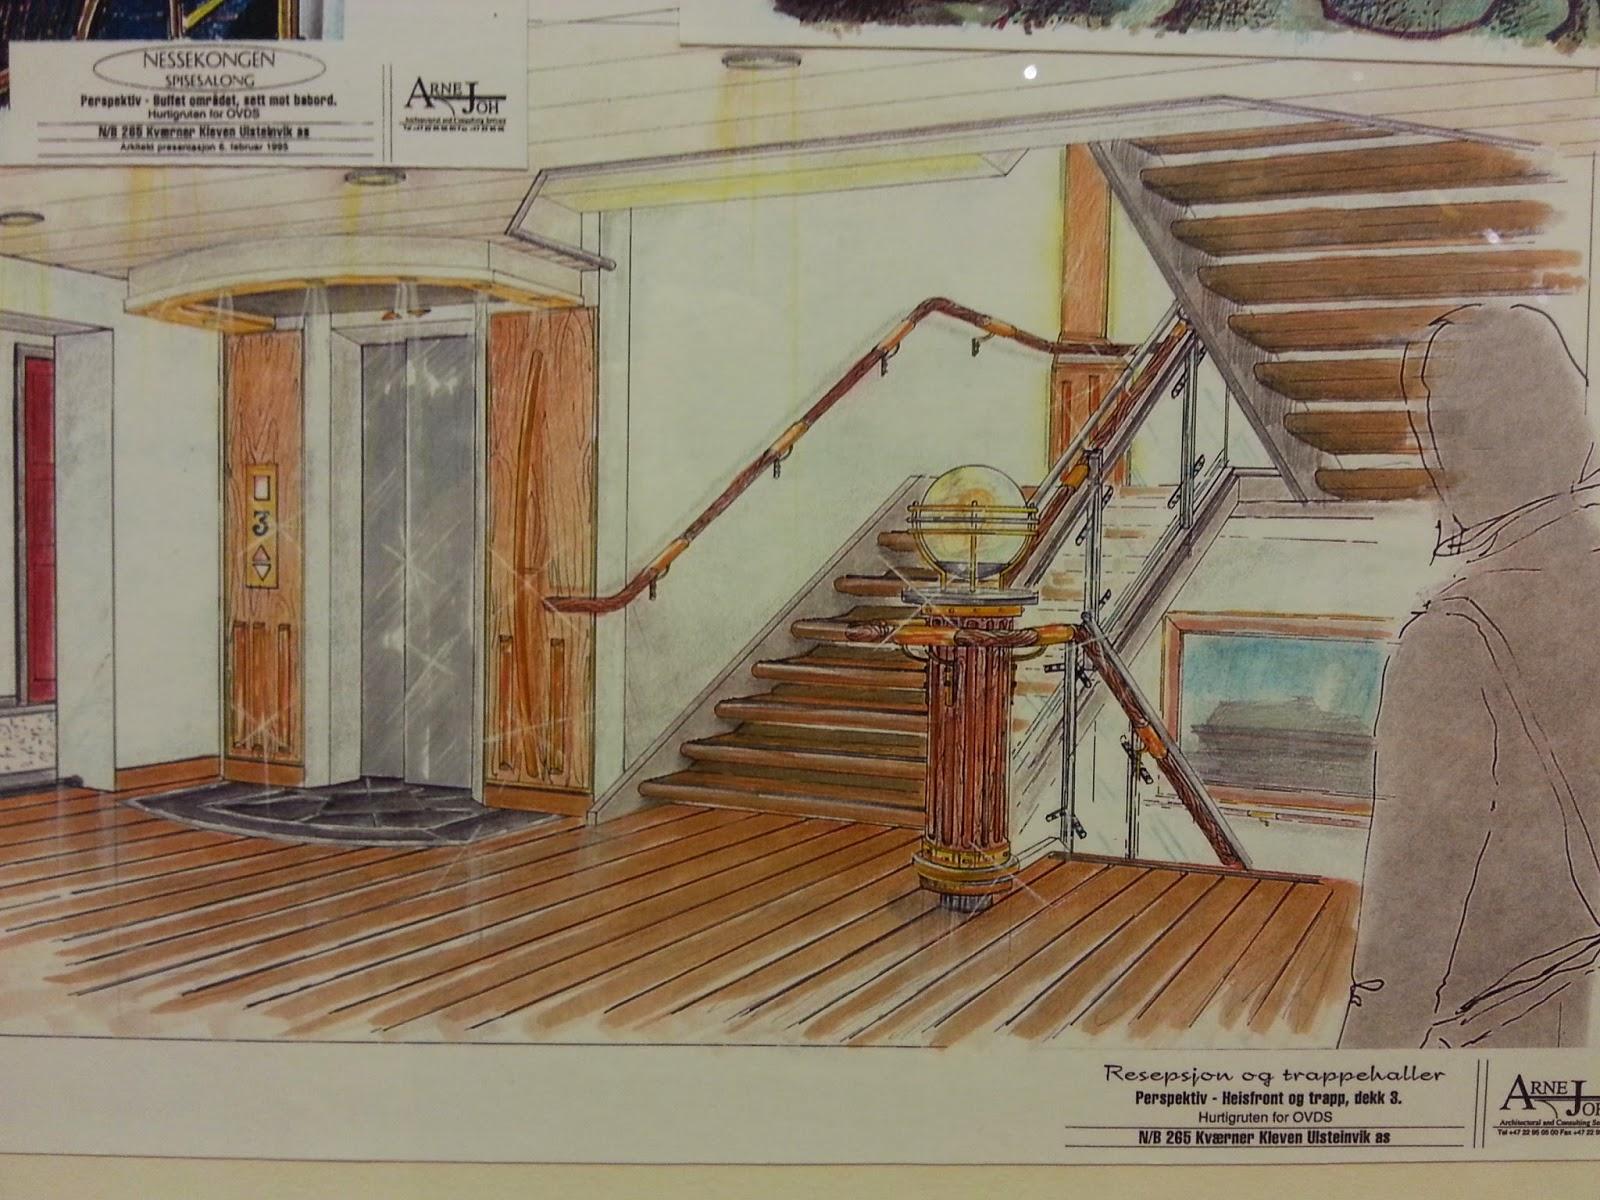 Hurtigruten MS Nordkapp - Artist's impression of a stairwell